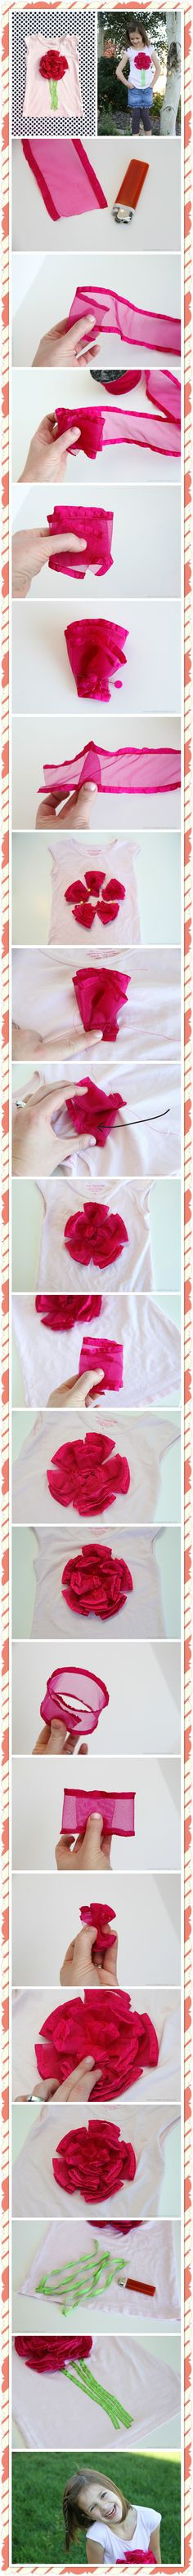 DIY puffy ribbon flower shirt diy crafts home made easy crafts craft idea crafts ideas diy ideas diy crafts diy idea do it yourself diy projects diy craft